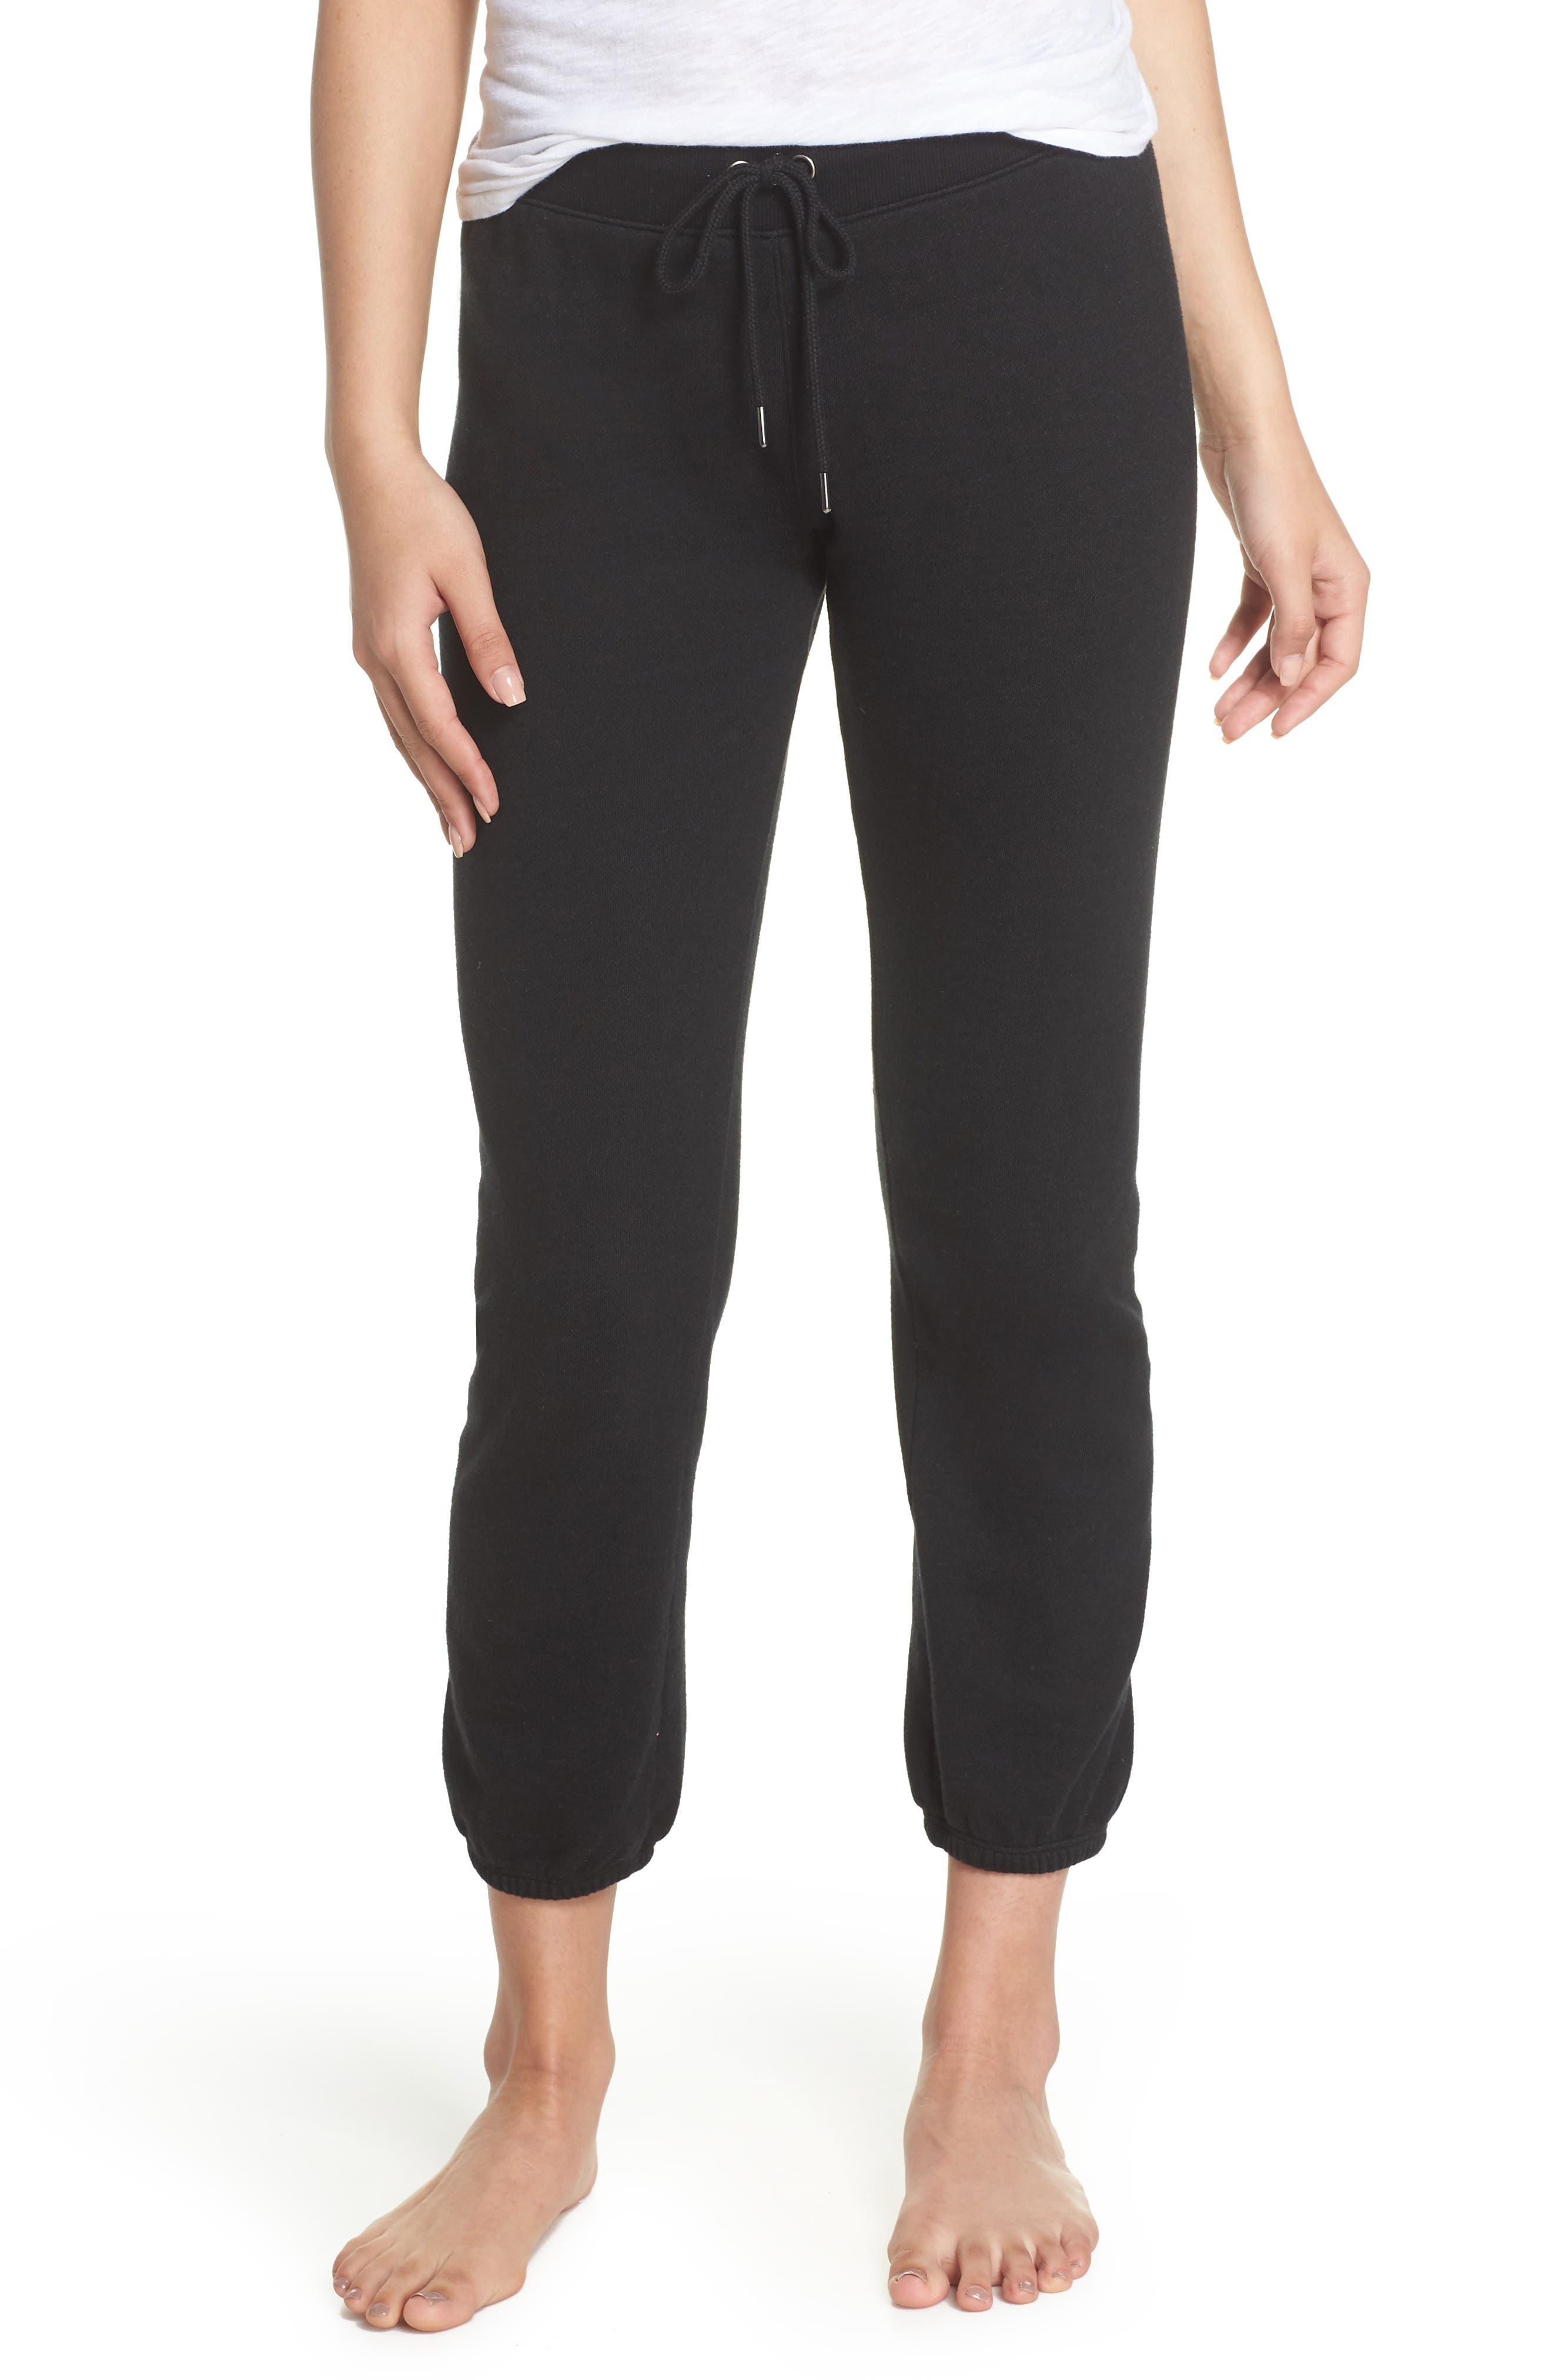 Loung Sweatpants,                             Main thumbnail 1, color,                             FADED BLACK